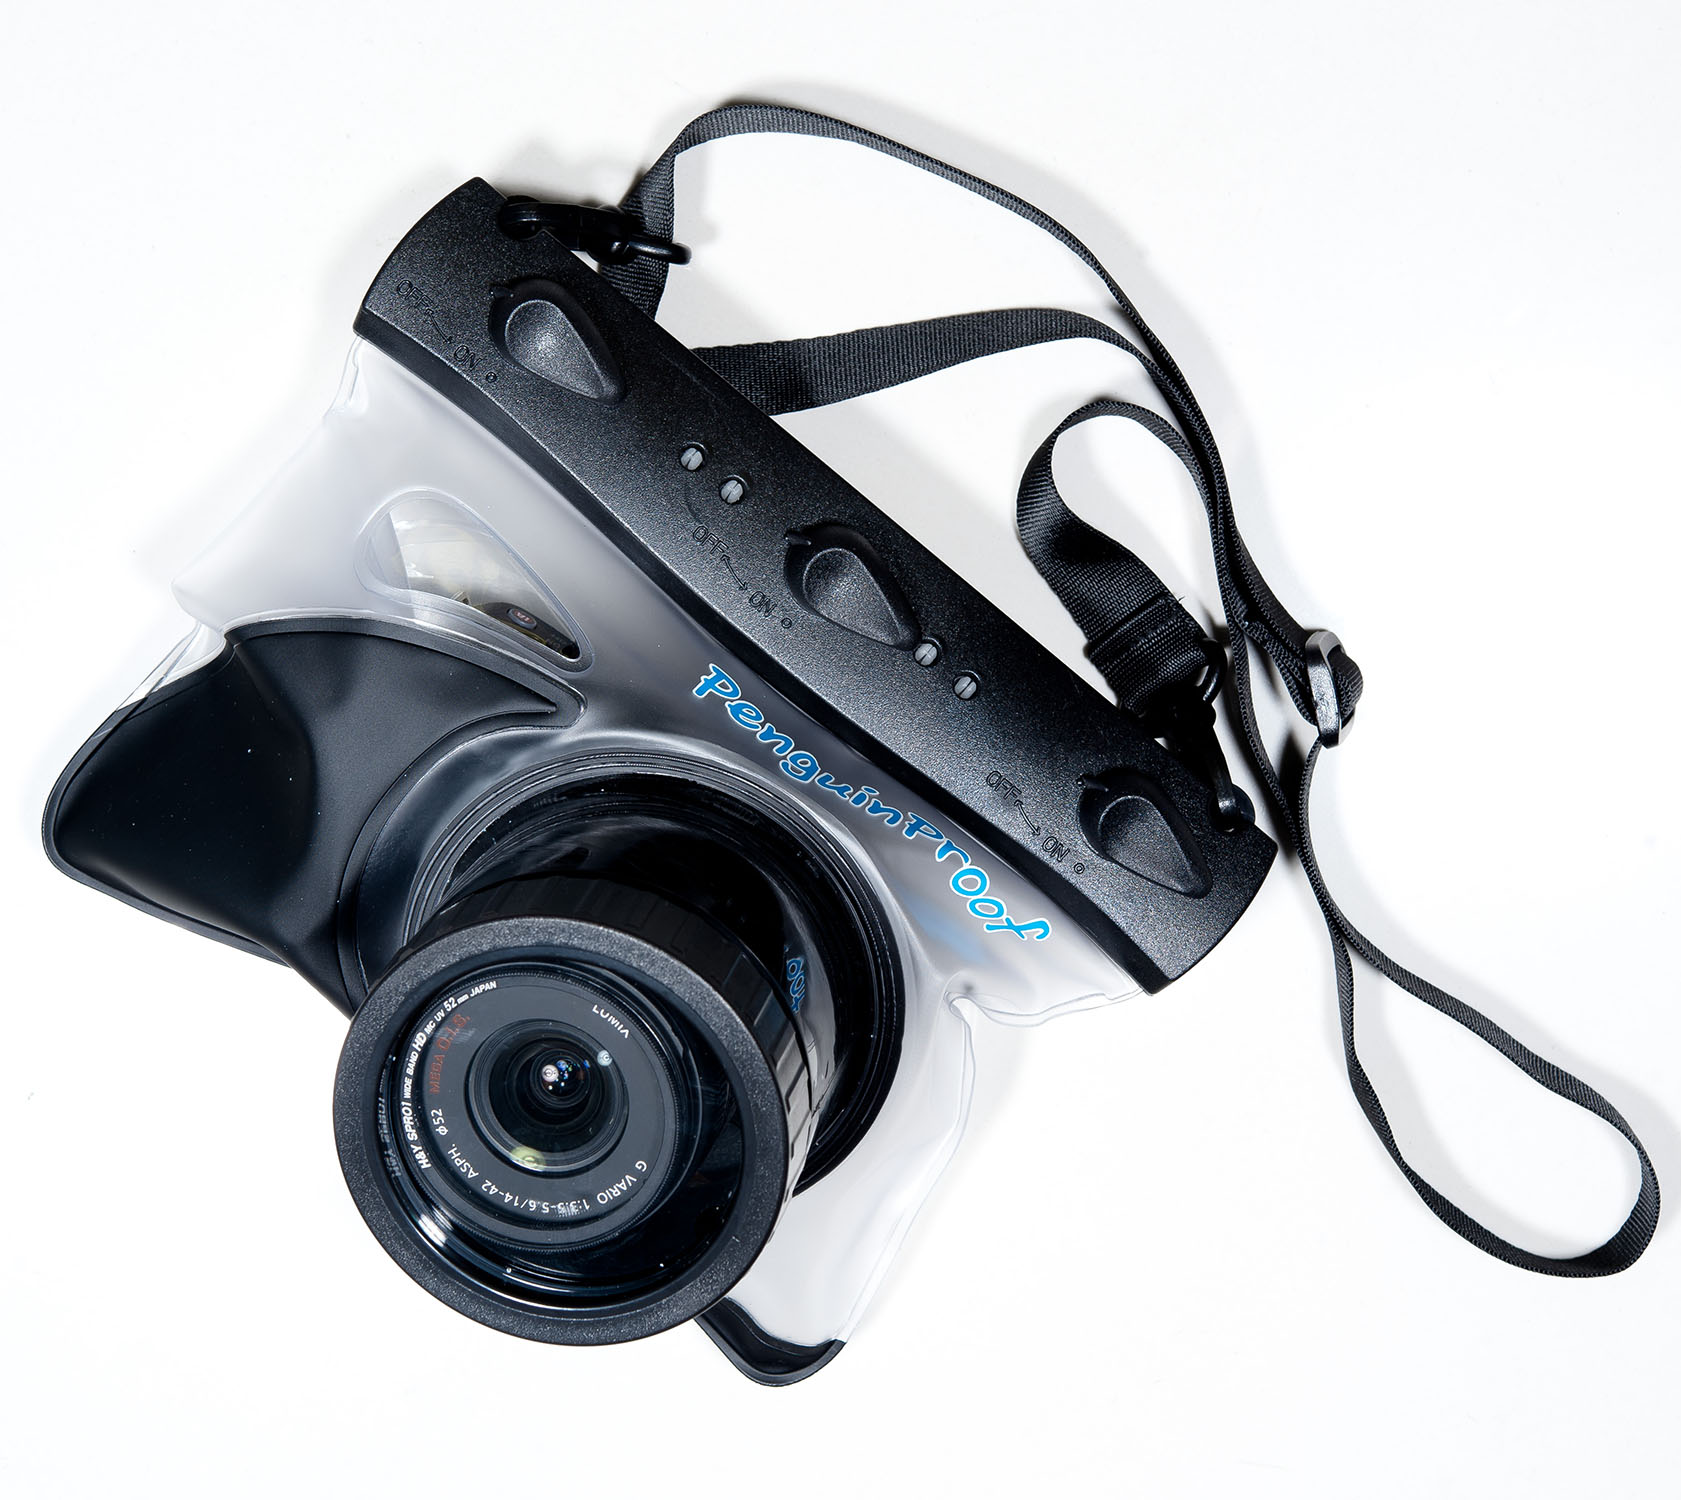 MD-07 Pro ซองกันน้ำสำหรับกล้อง Mirrorless ที่มีช่องมองภาพ (Viewfinder) หรือ ขนาดใหญ่ หน้าอะคริลิค